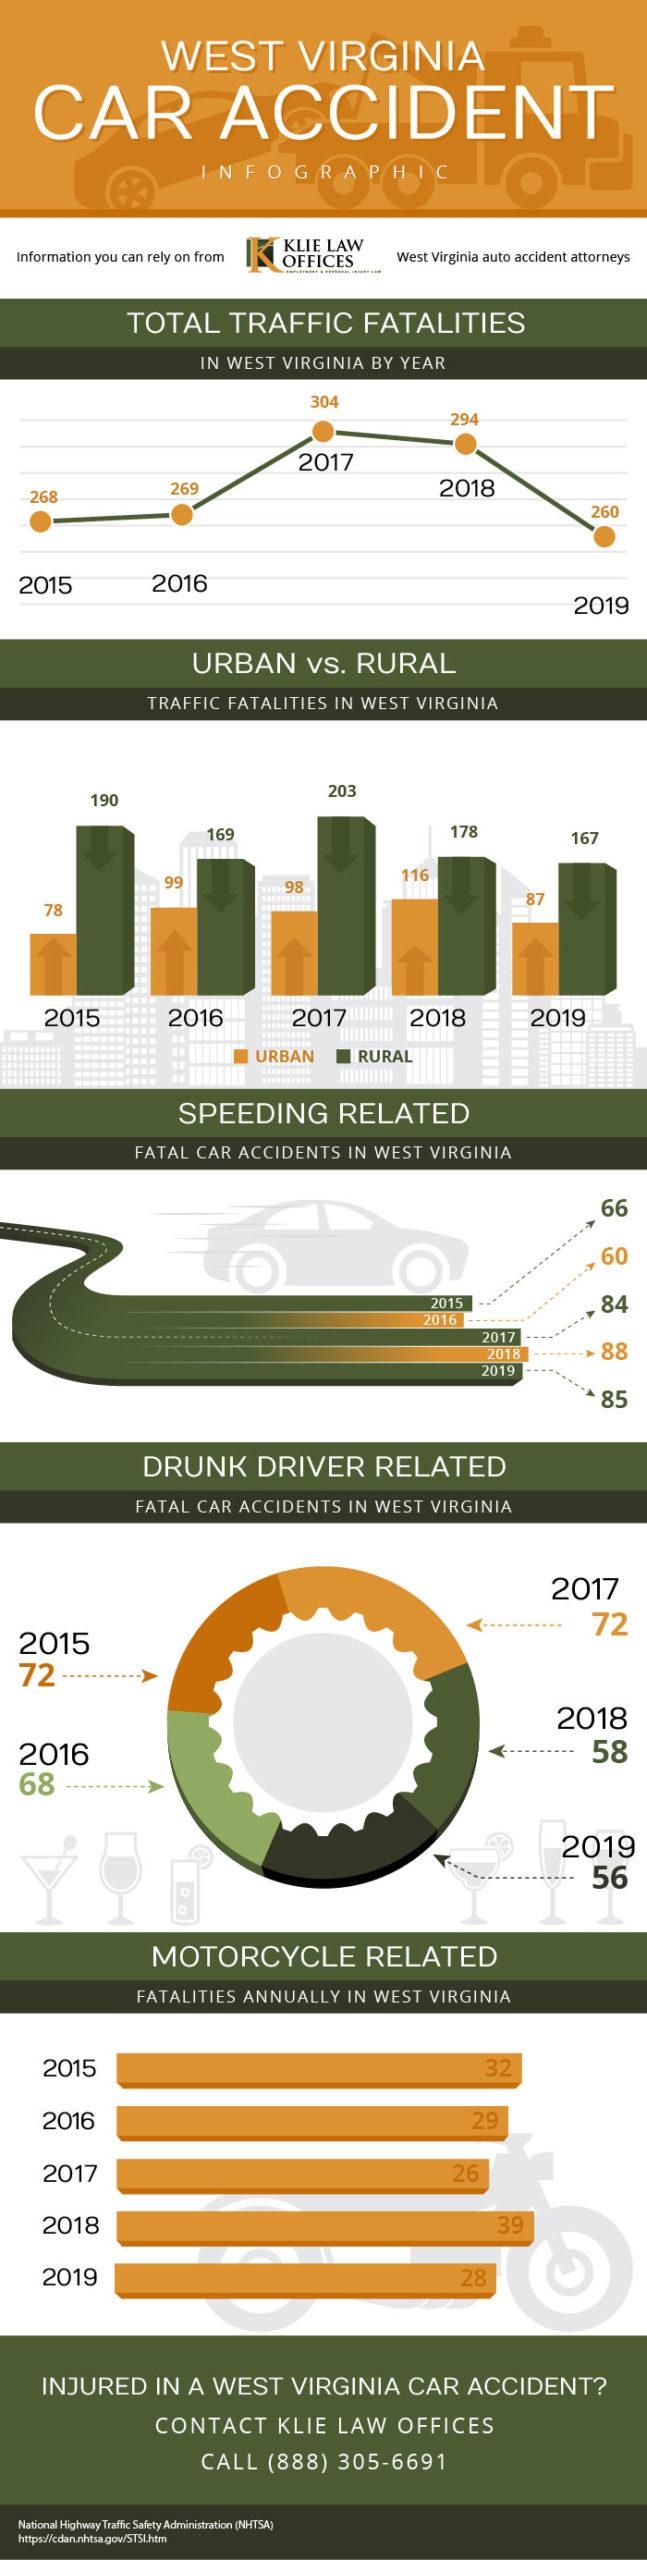 West Virginia Car Accident infographic